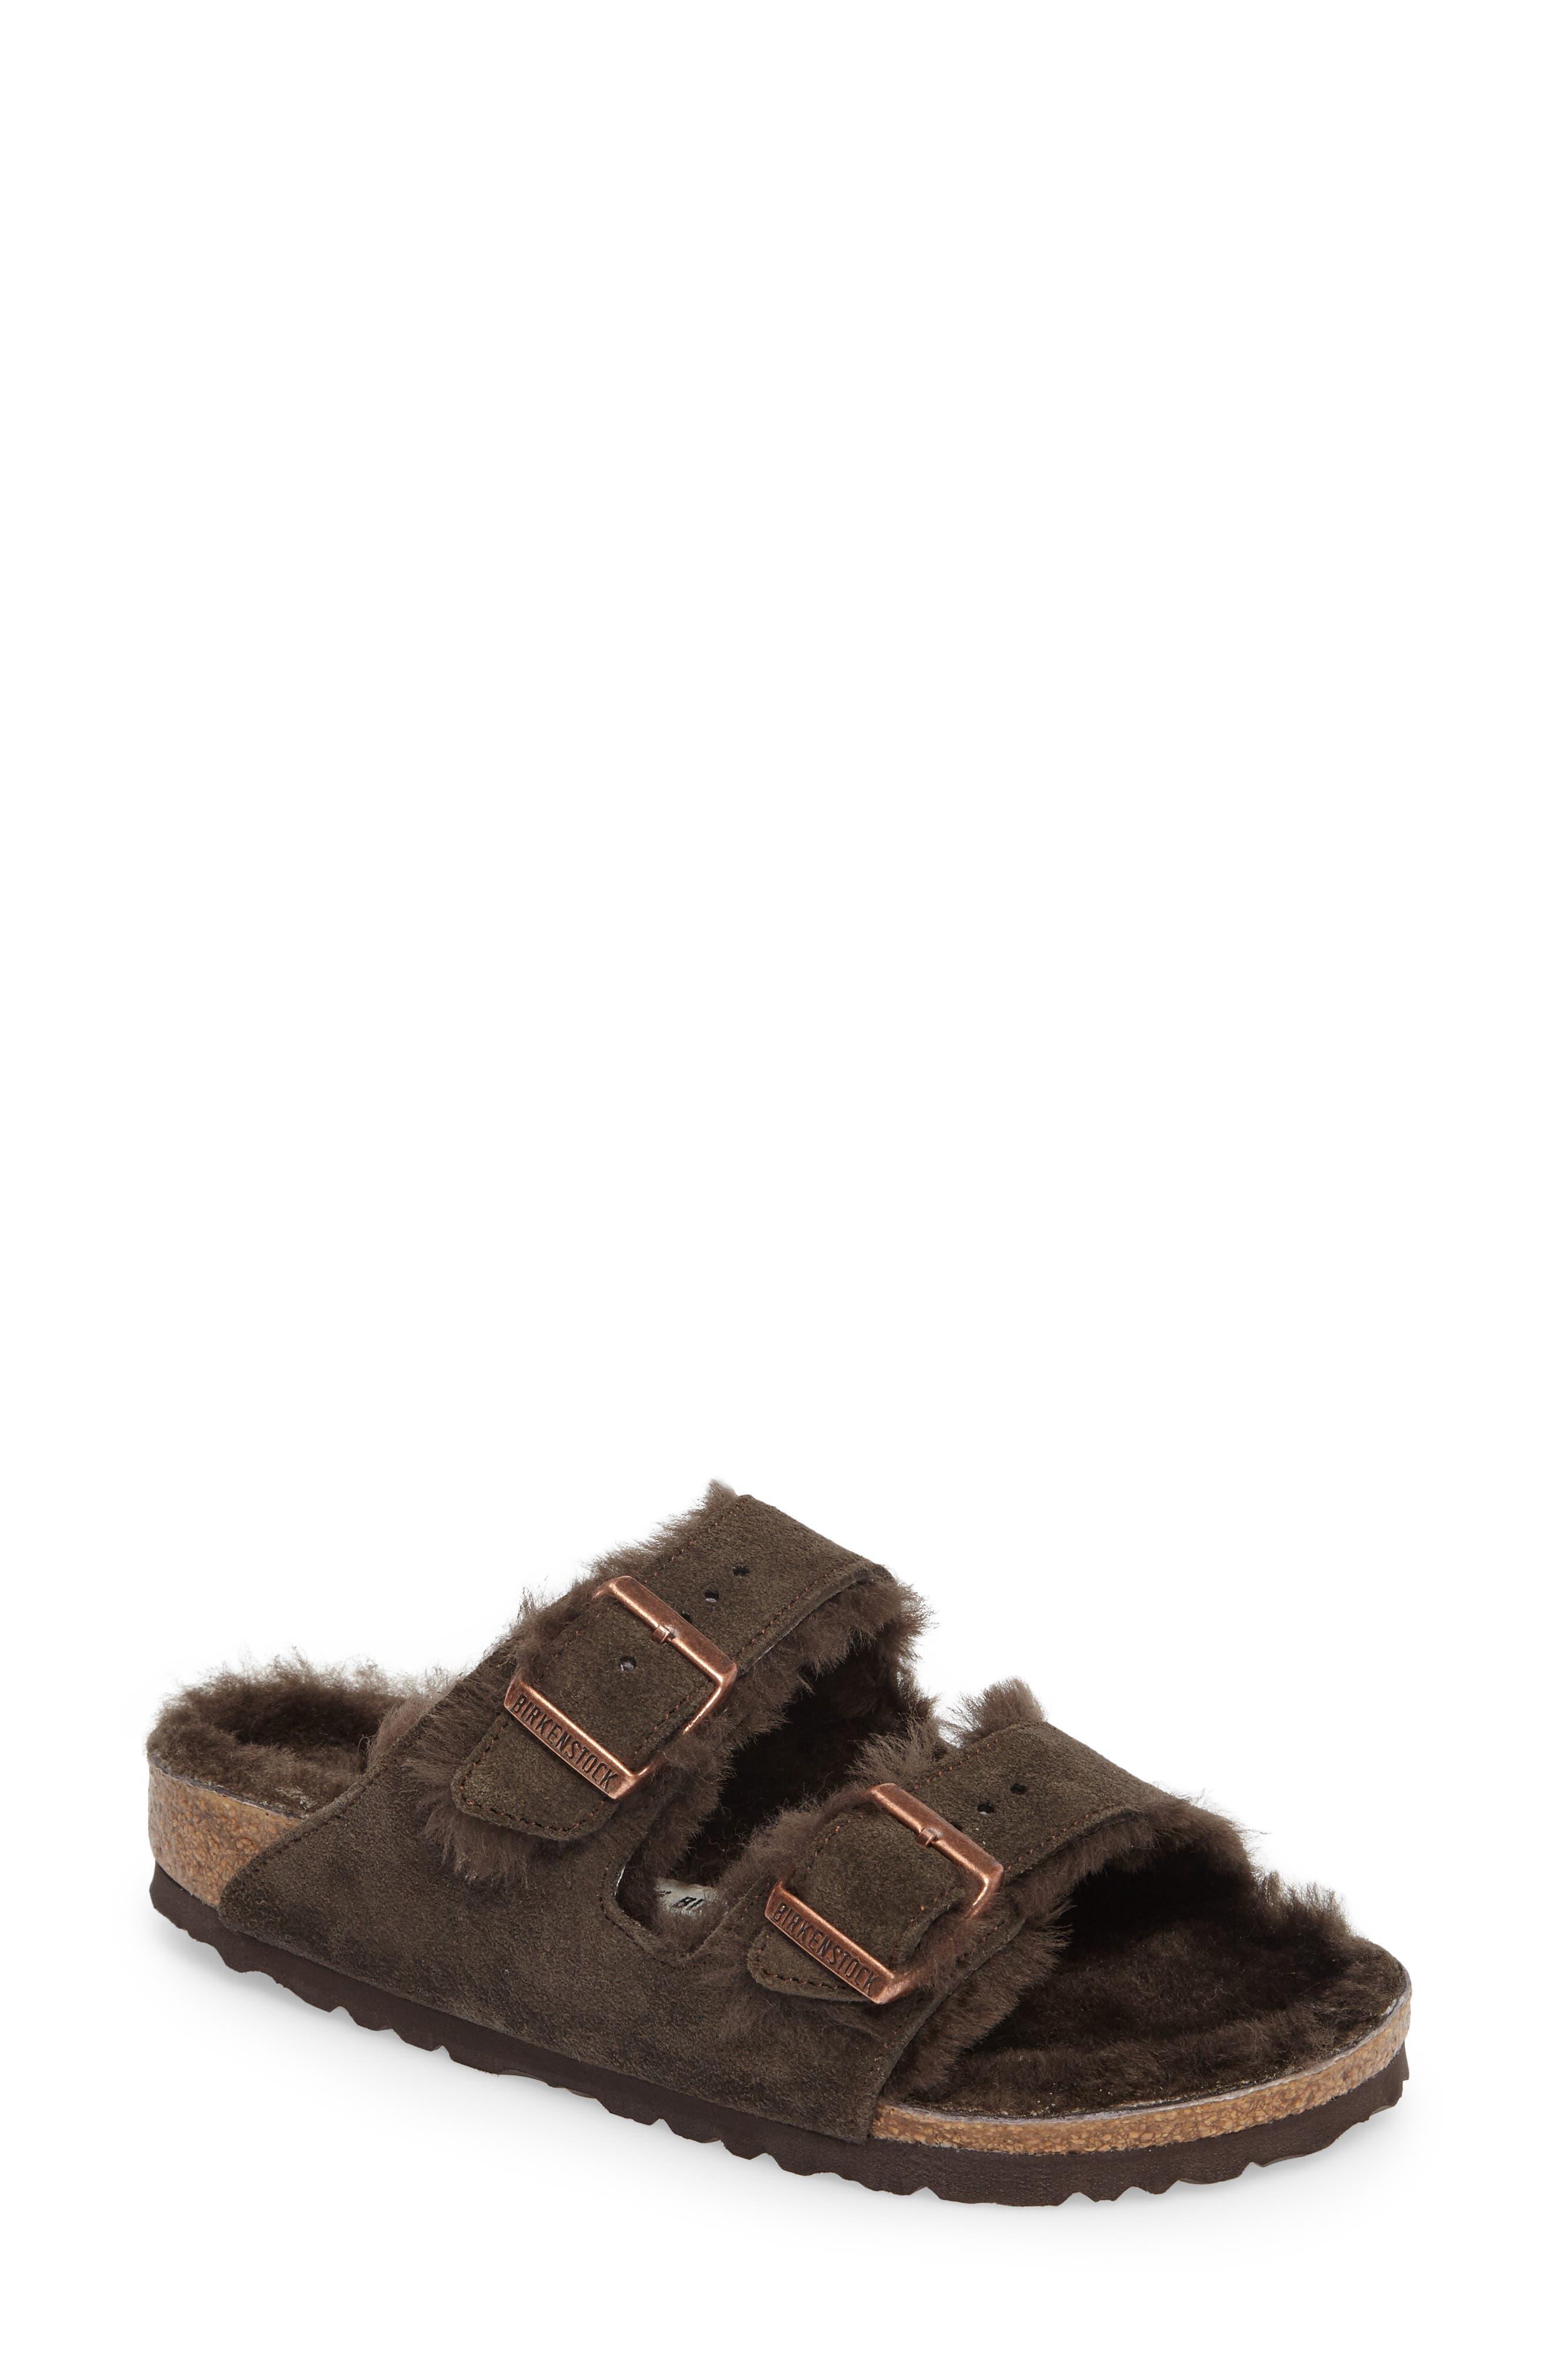 Arizona Genuine Shearling Lined Sandal,                             Main thumbnail 1, color,                             200